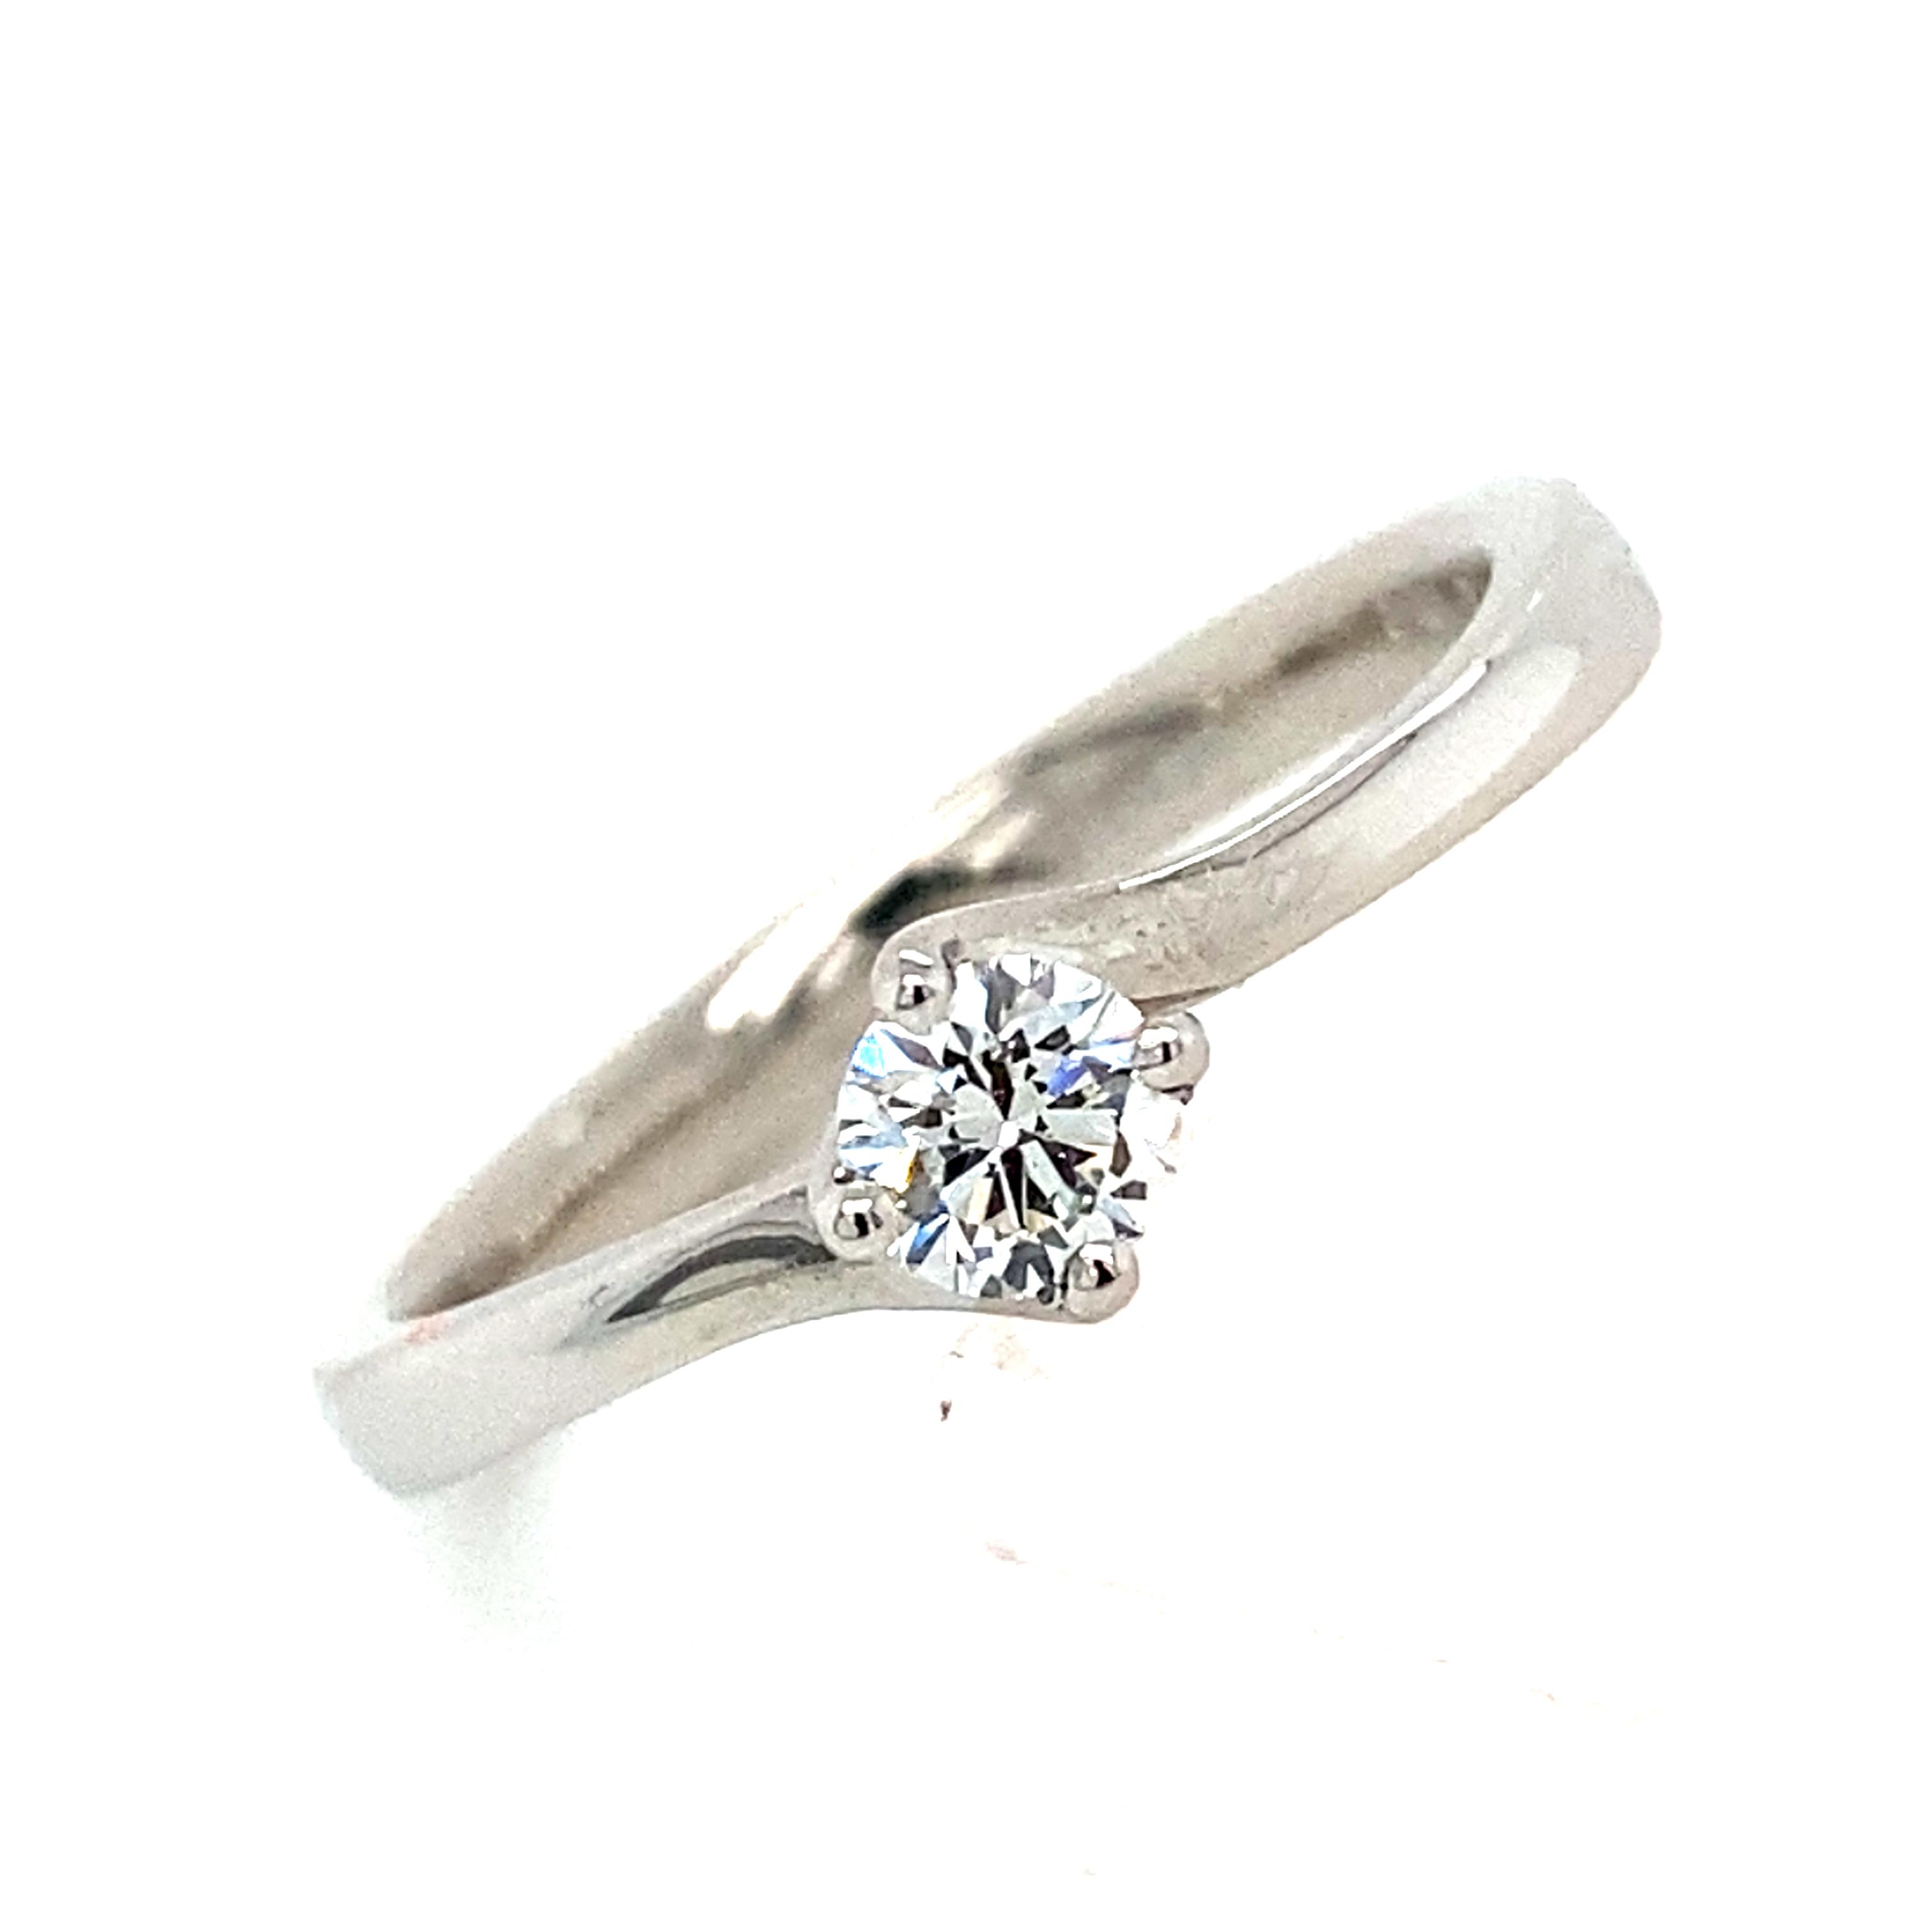 Platinum Engagement ring ith a 0.22 Carat GVS Diamond - Ivy